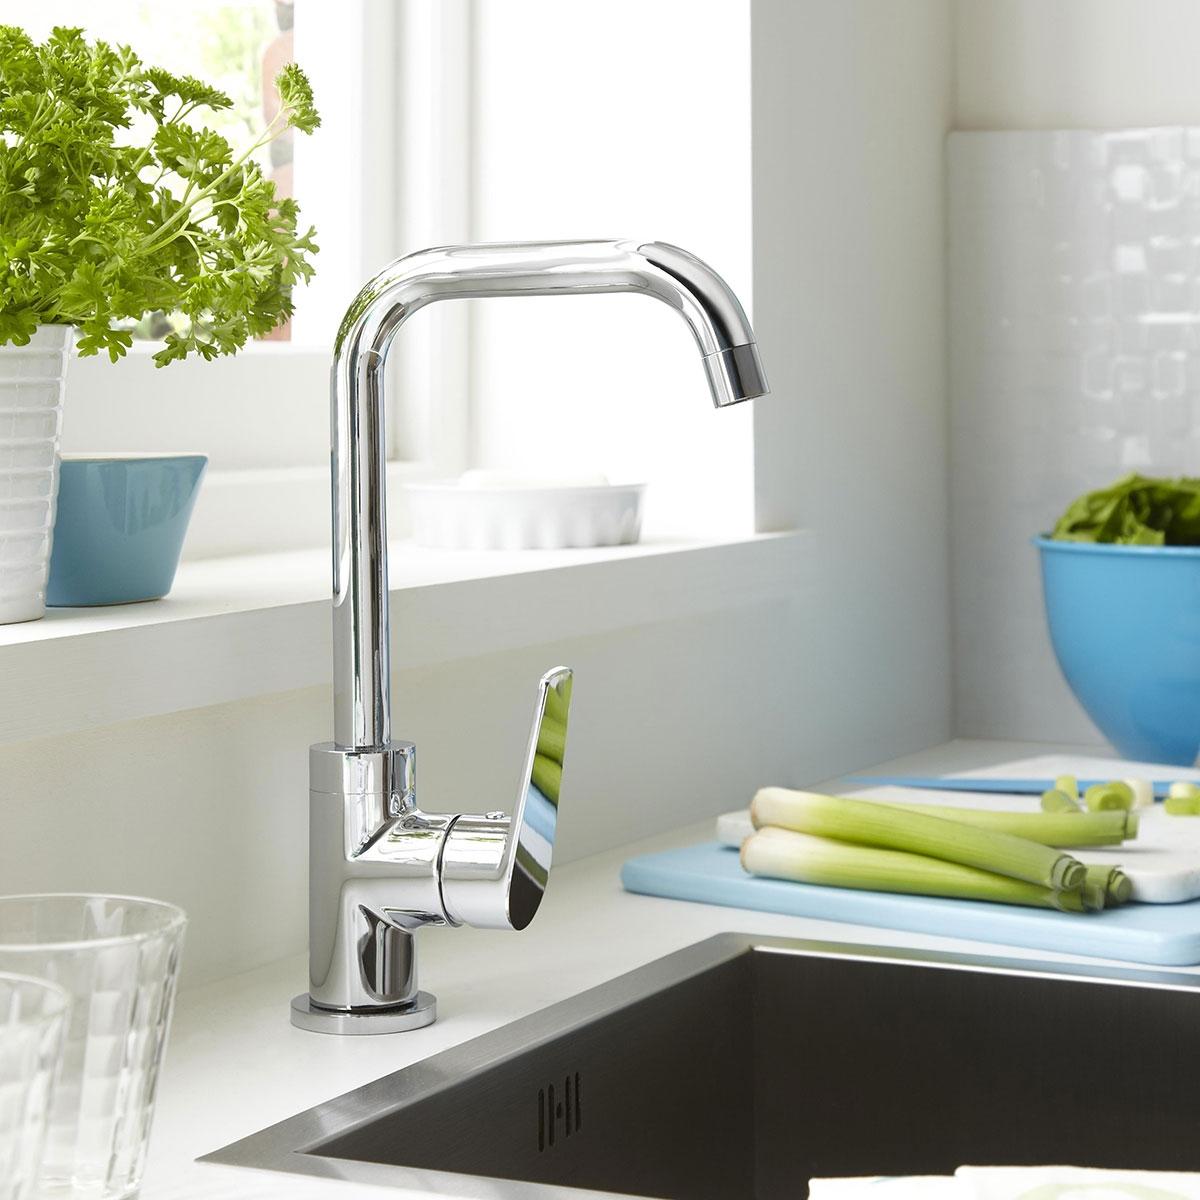 Bristan Blueberry Mono Kitchen Sink Mixer Tap Single Handle - Chrome